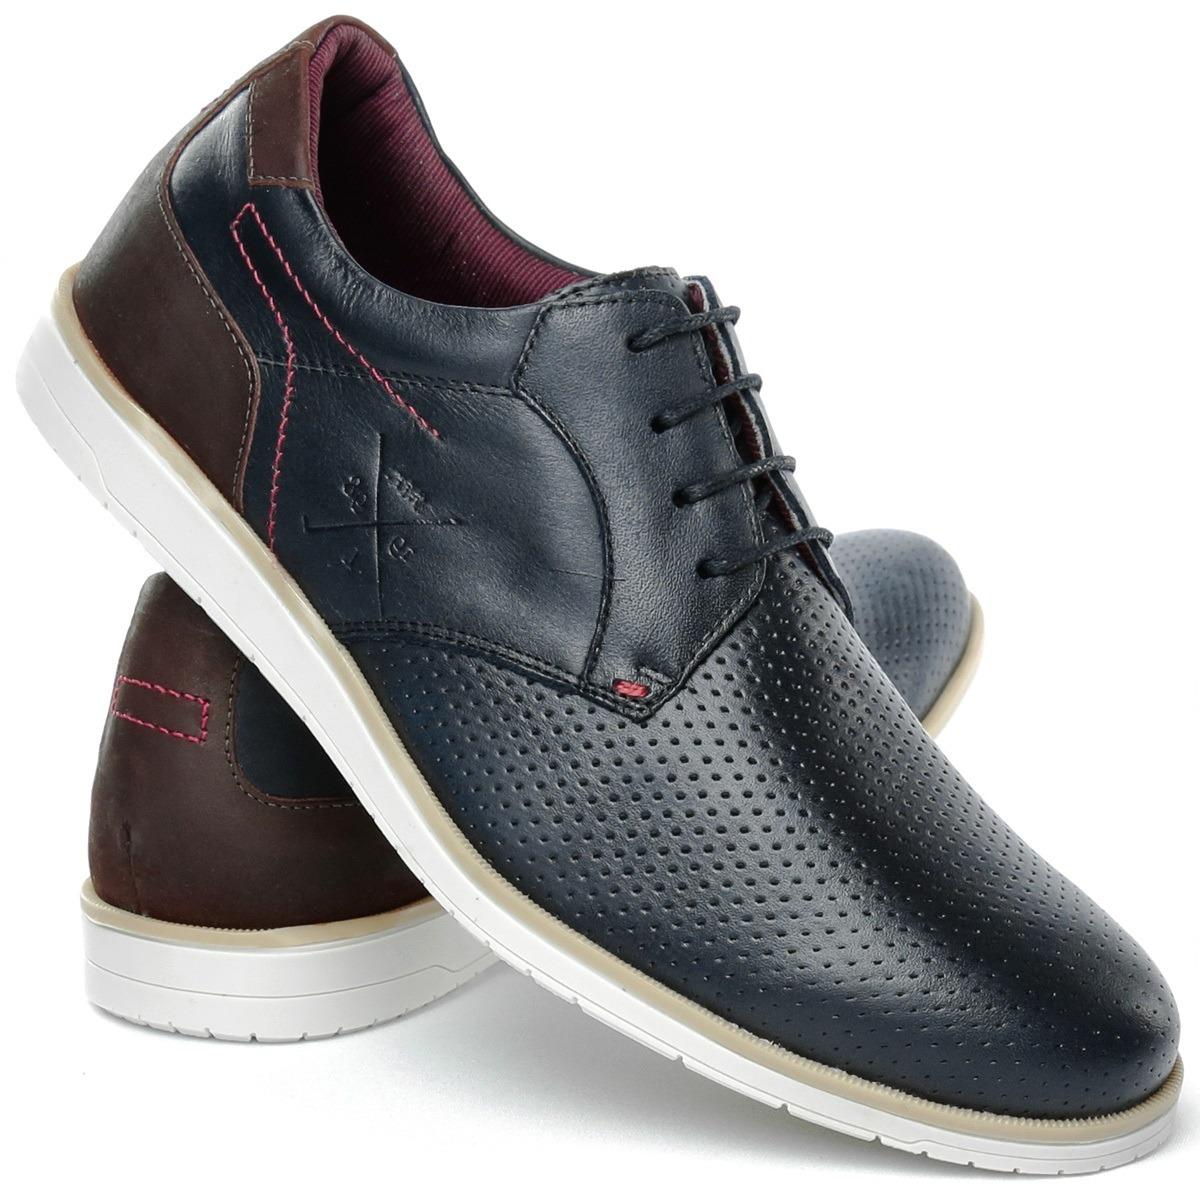 db2c2d17f Sapato Sapatênis Casual Oxford Masculino Em Couro - R$ 99,90 em ...